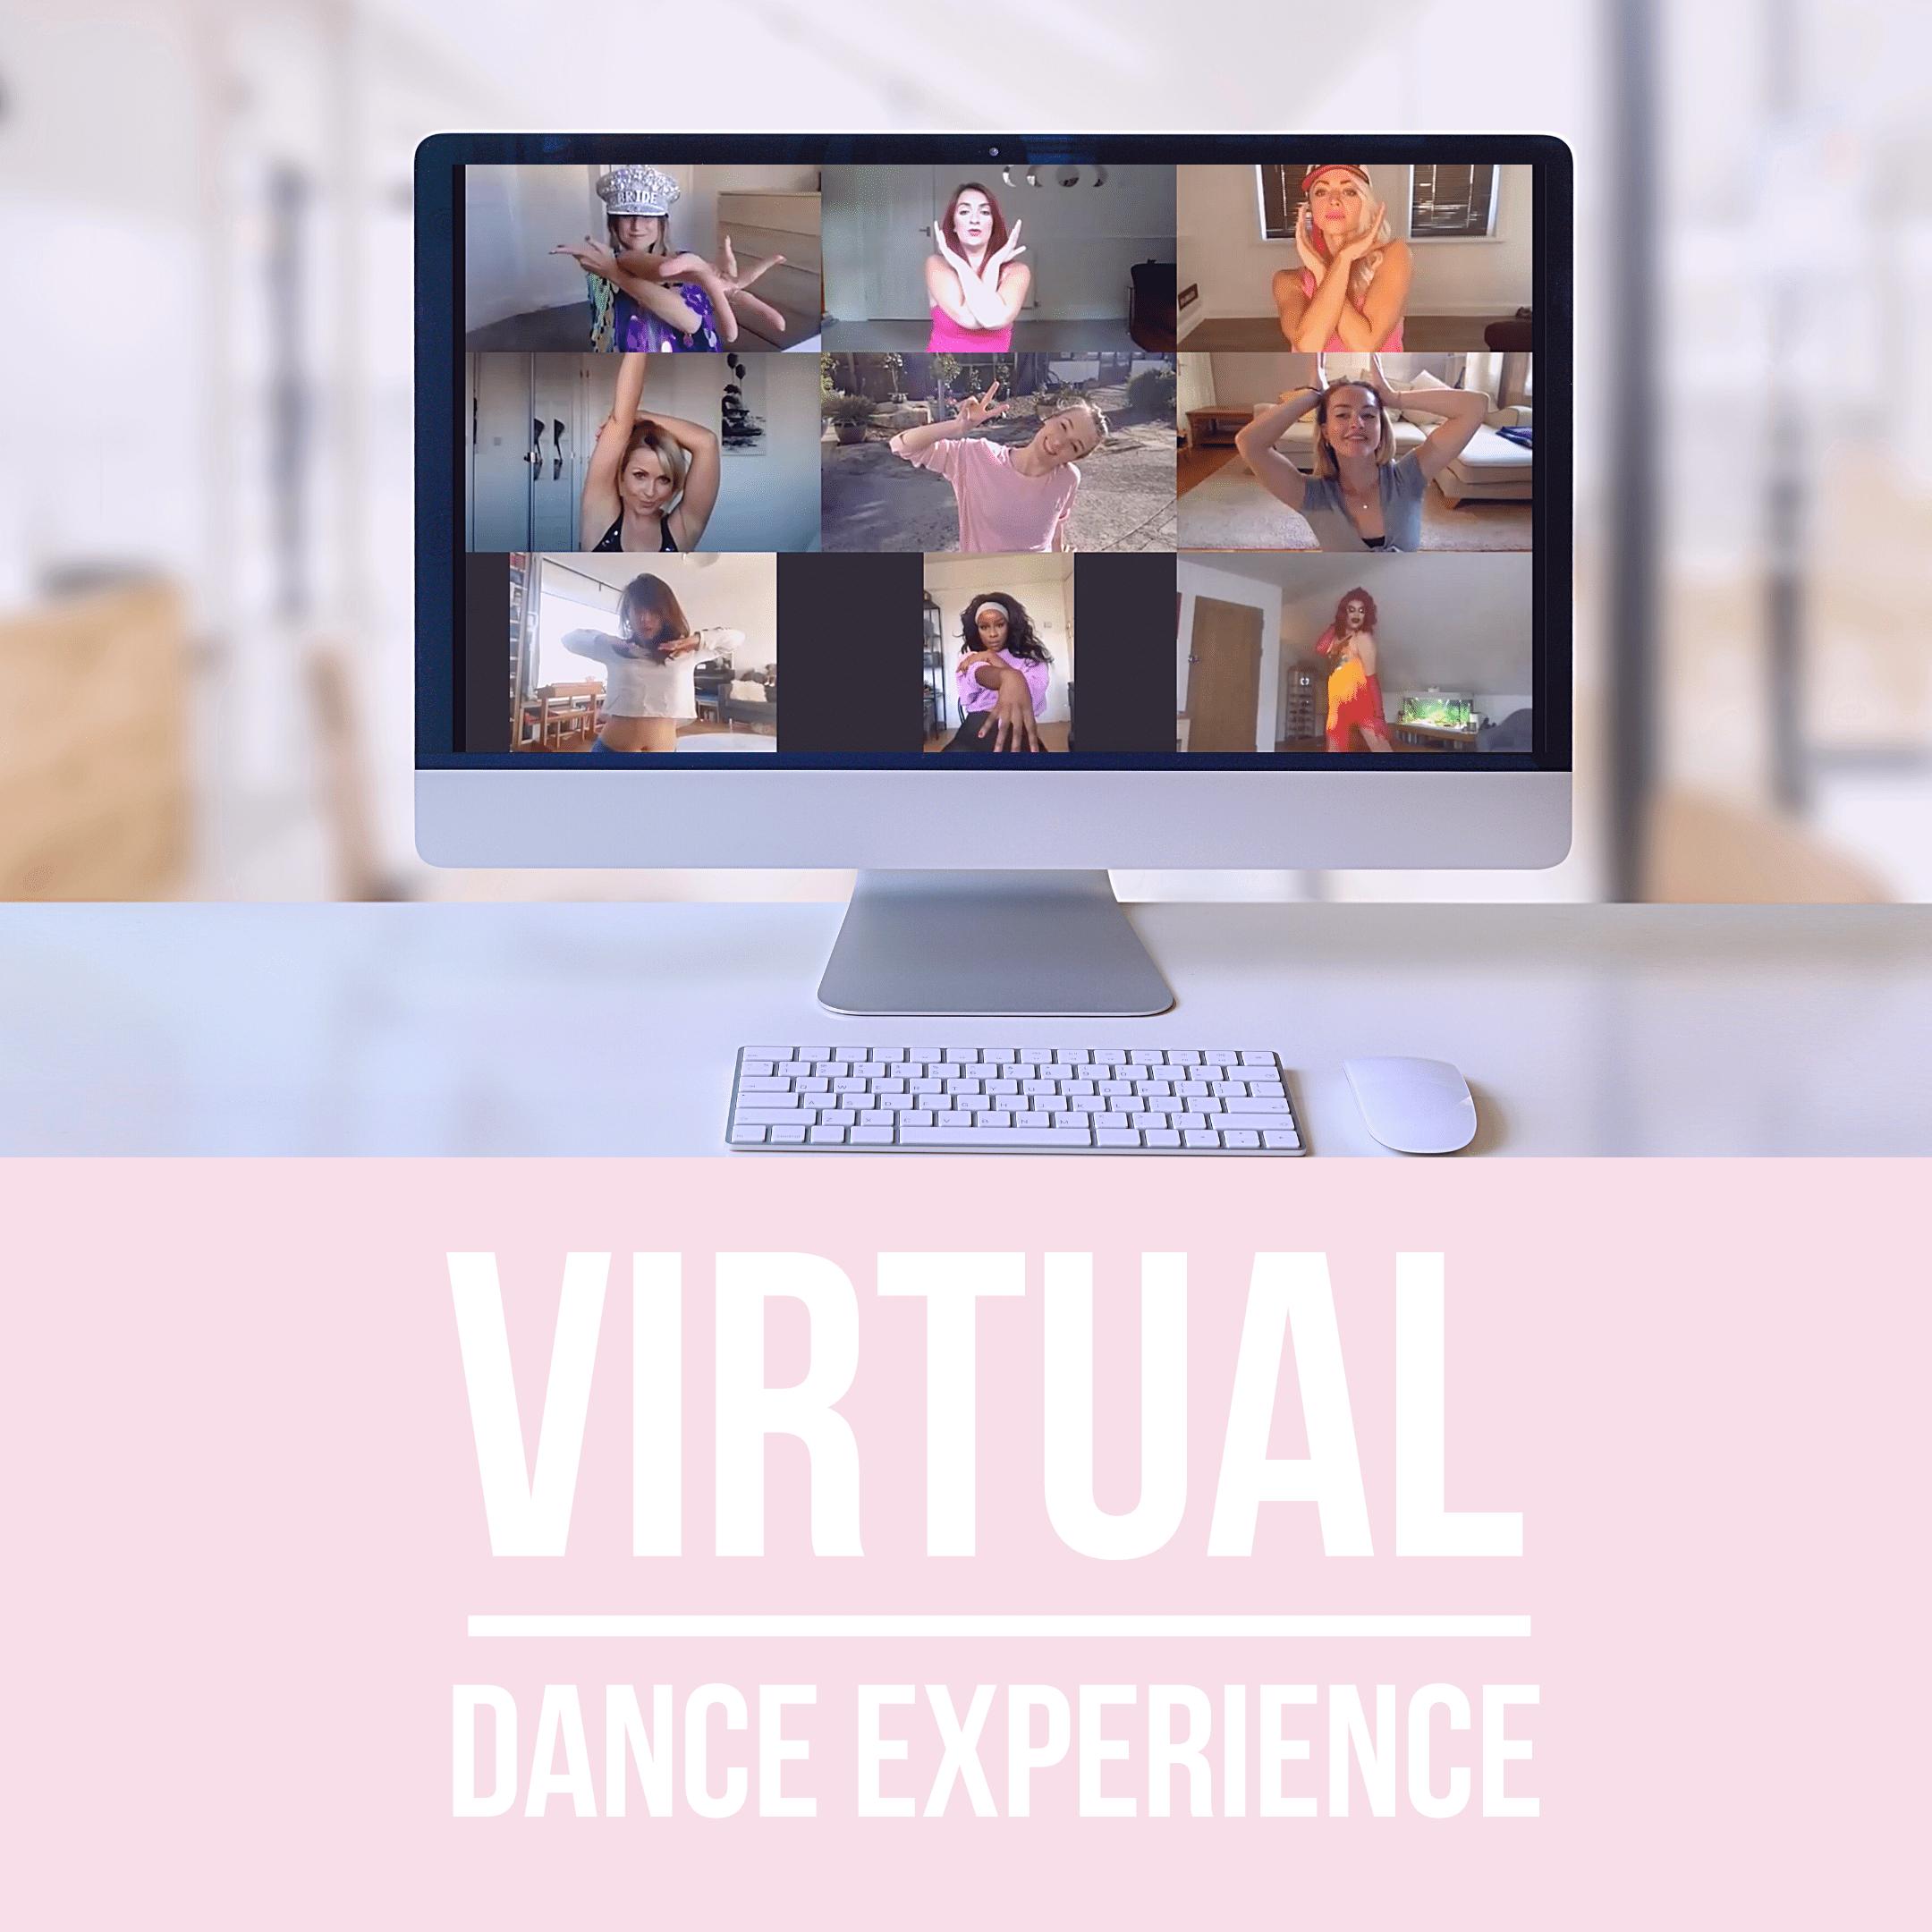 Virtual Dance Experience